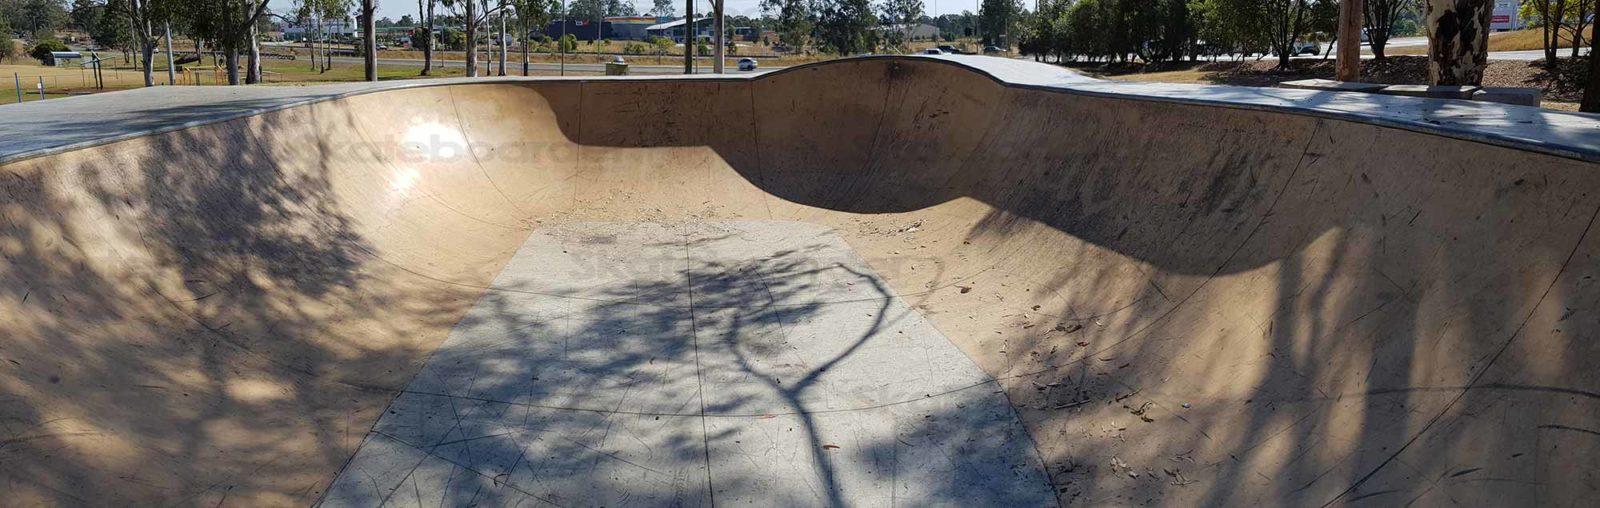 Jimboomba Skatepark Bowl